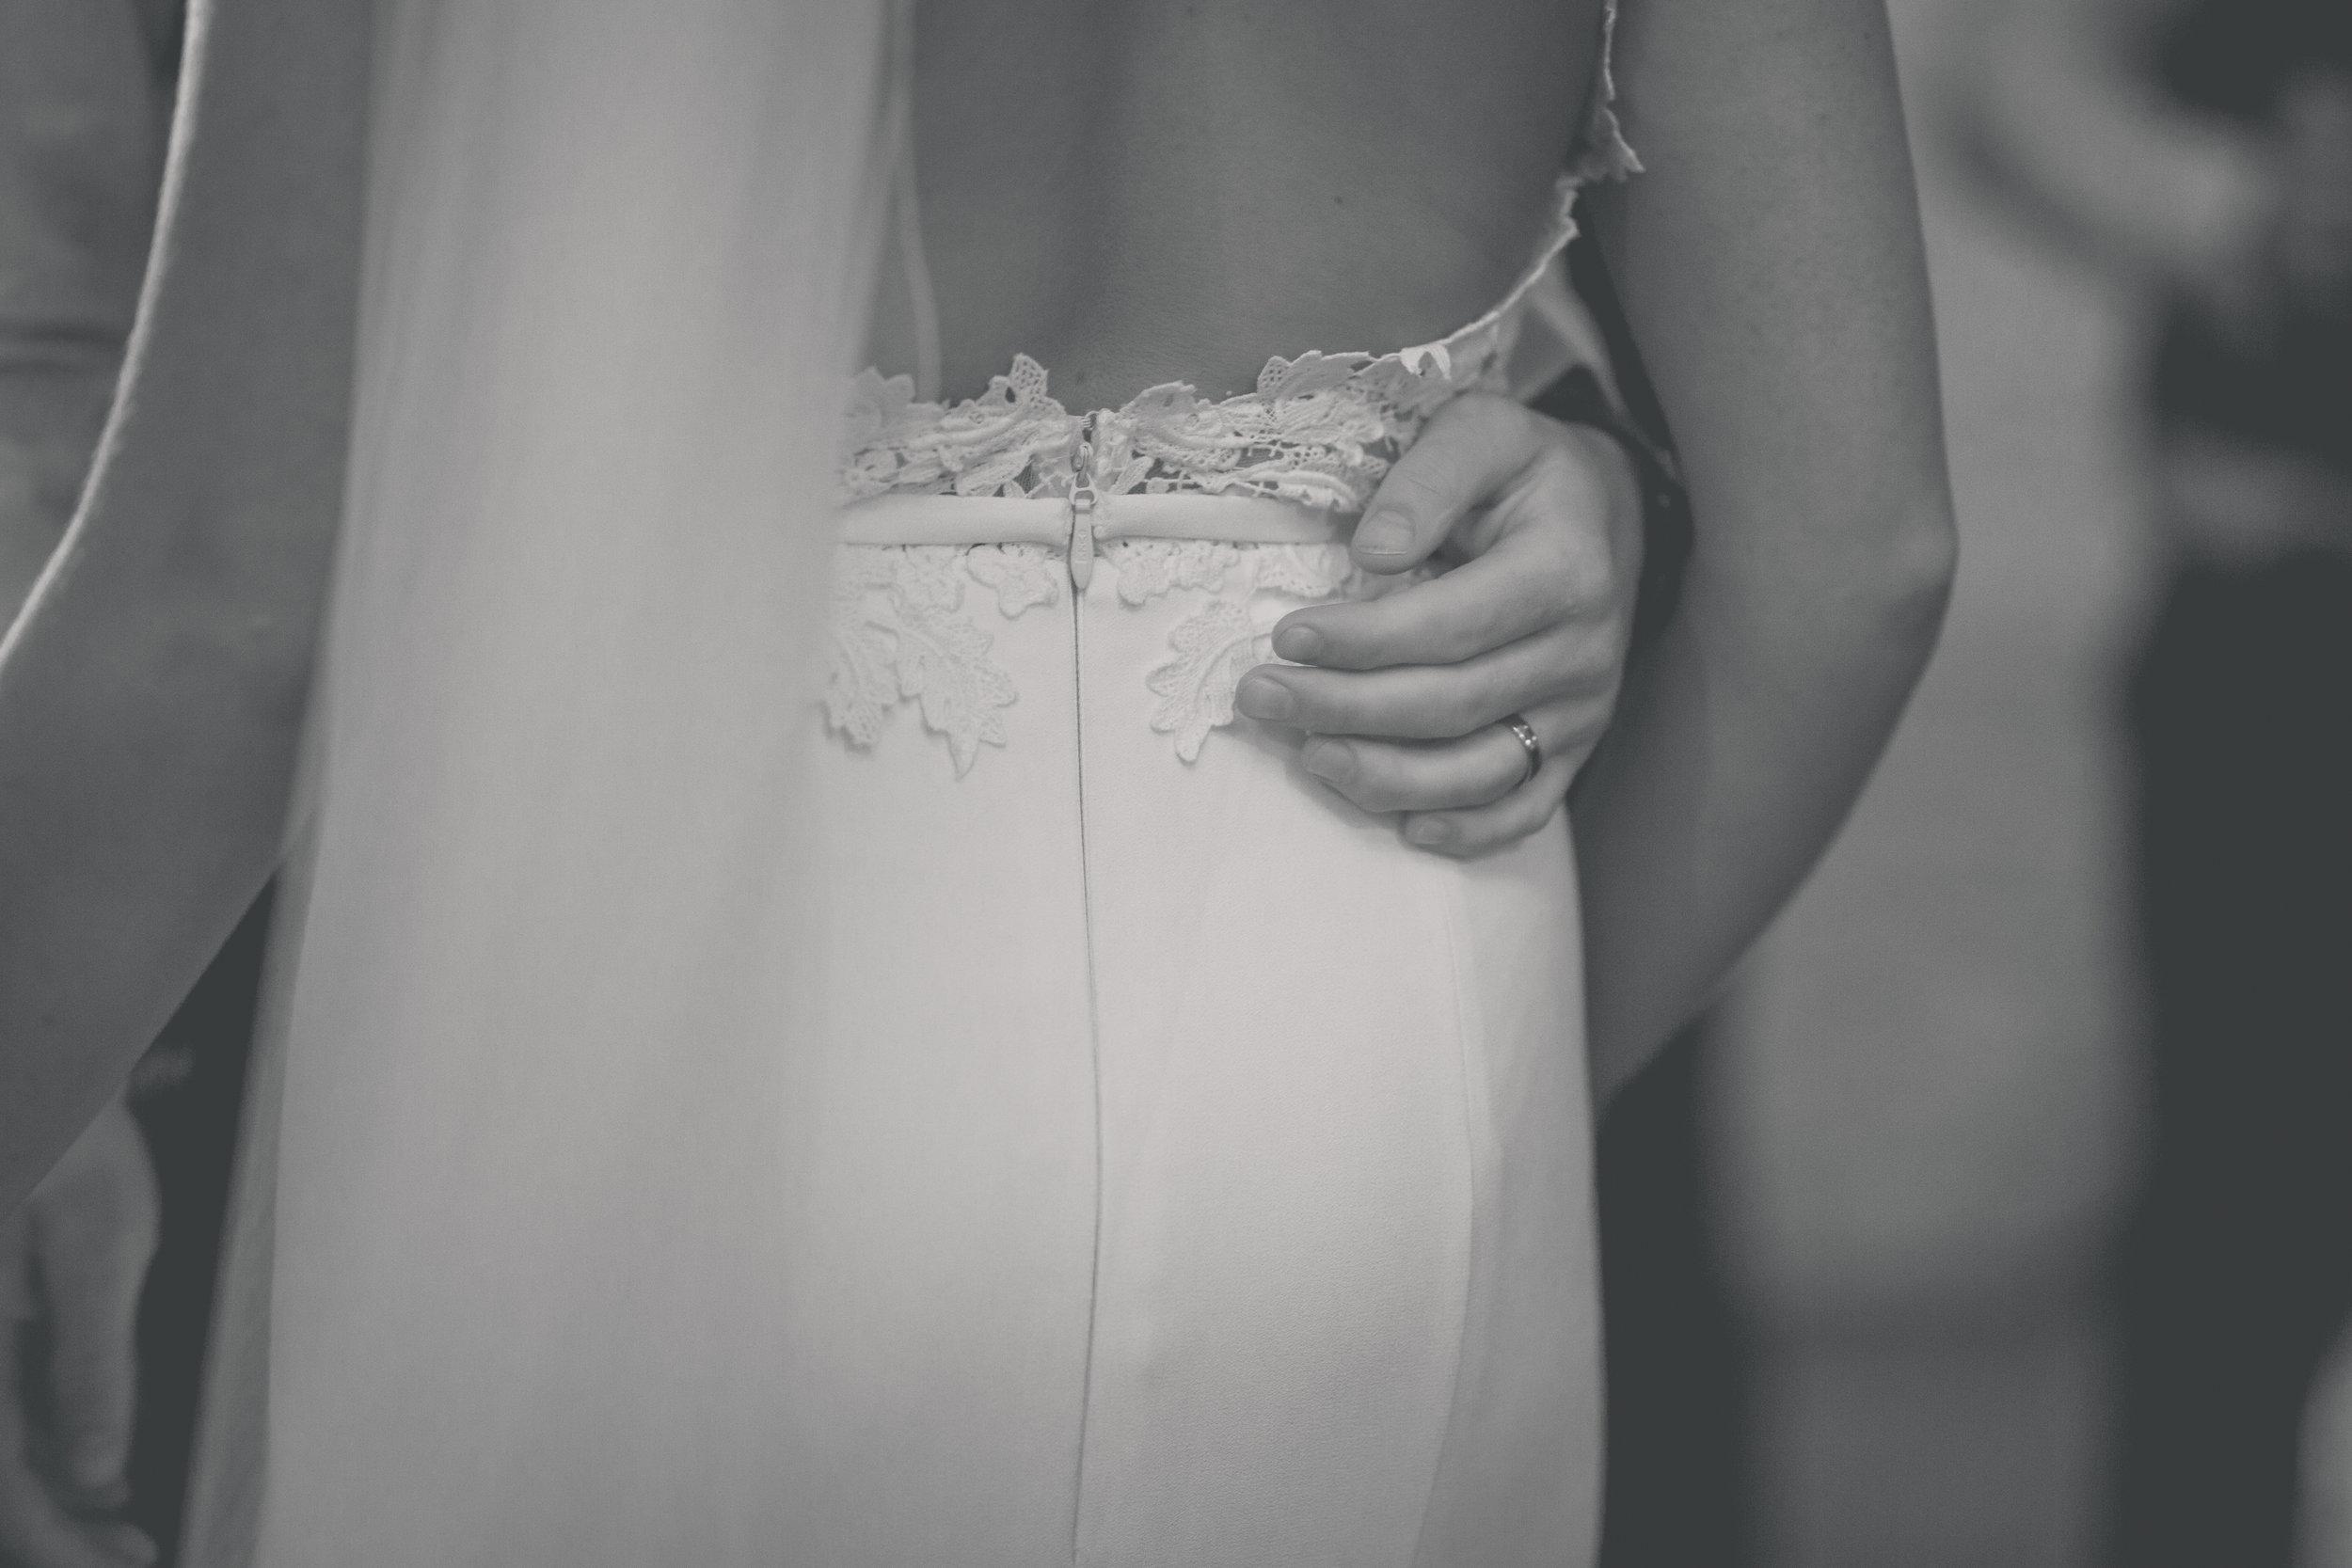 Brian McEwan Wedding Photography | Carol-Annee & Sean | The Dancing-51.jpg